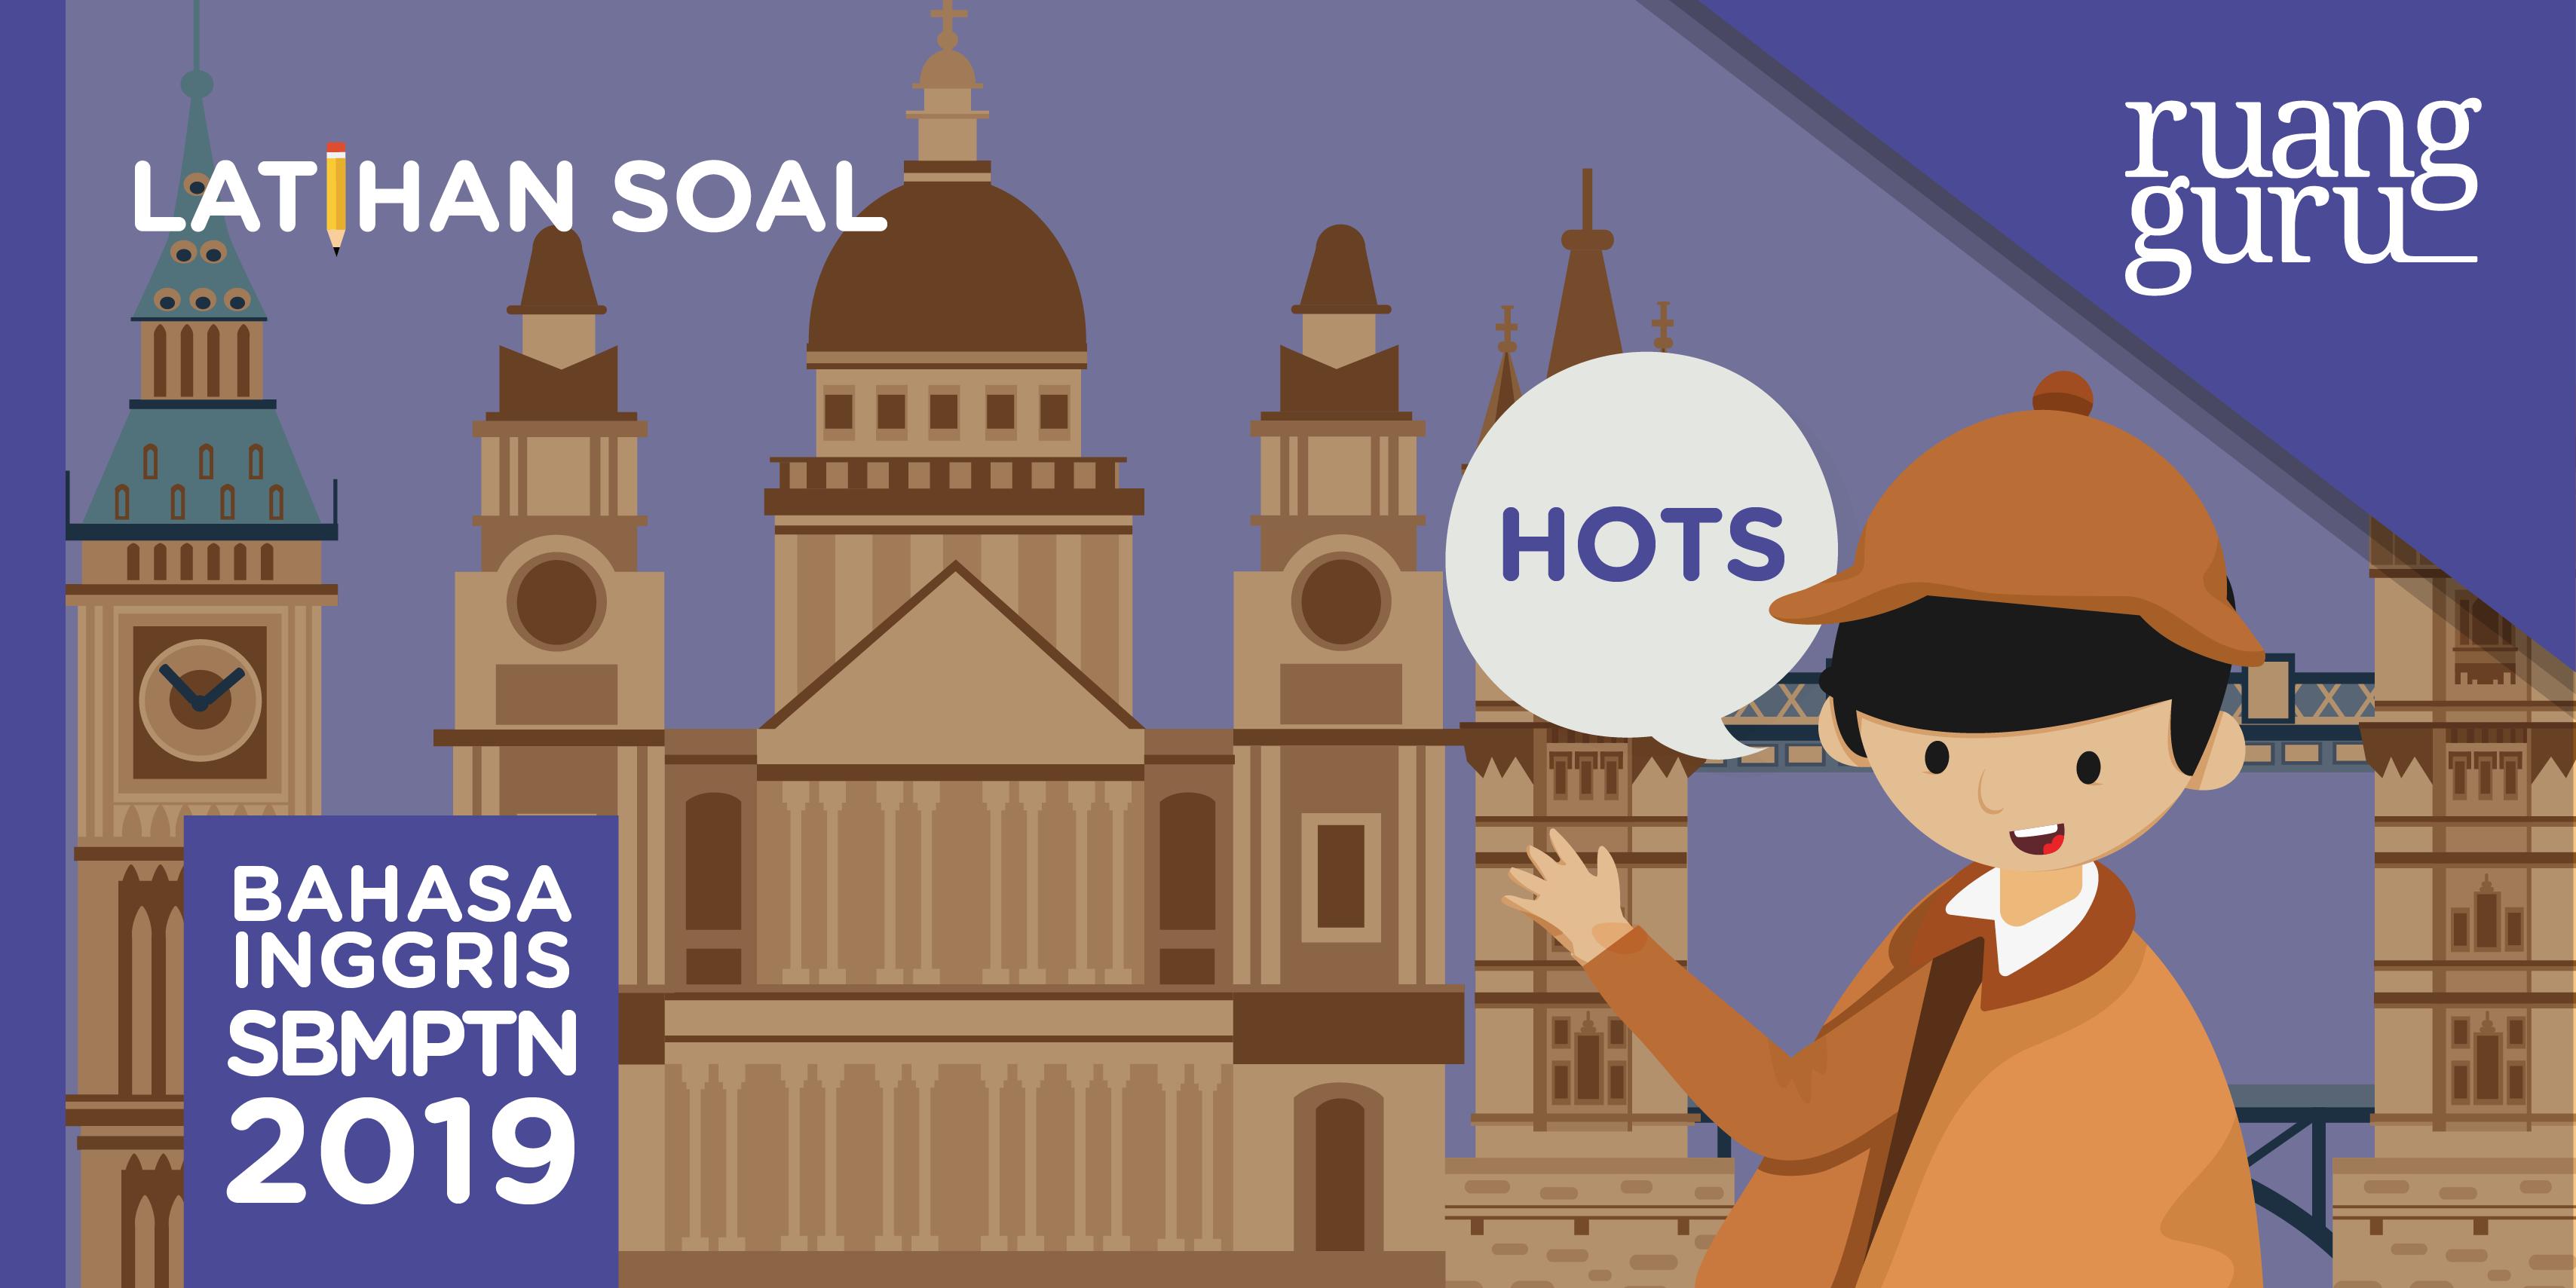 Latihan Soal Sbmptn Hots Dan Pembahasannya 2019 Bahasa Inggris